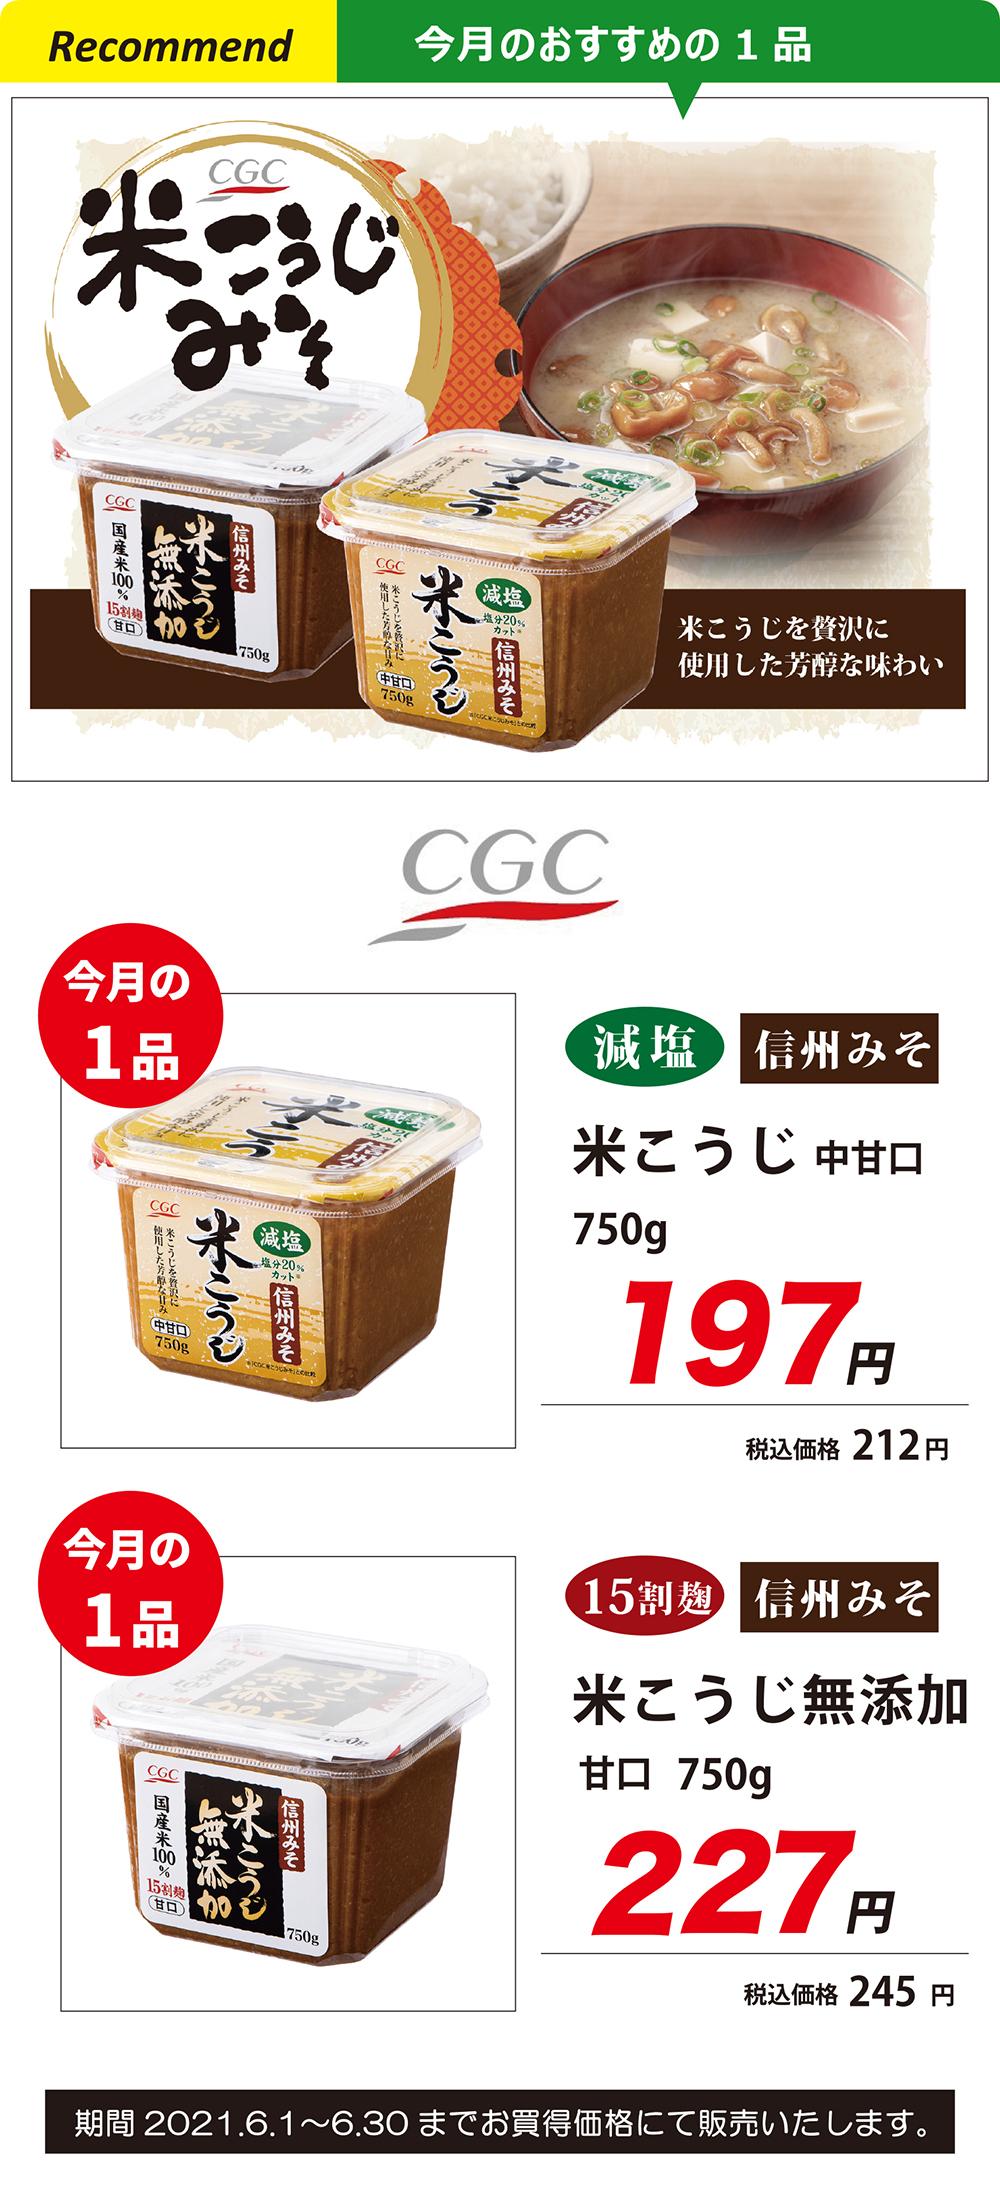 CGC 信州みそ 米こうじ減塩・米こうじ無添加